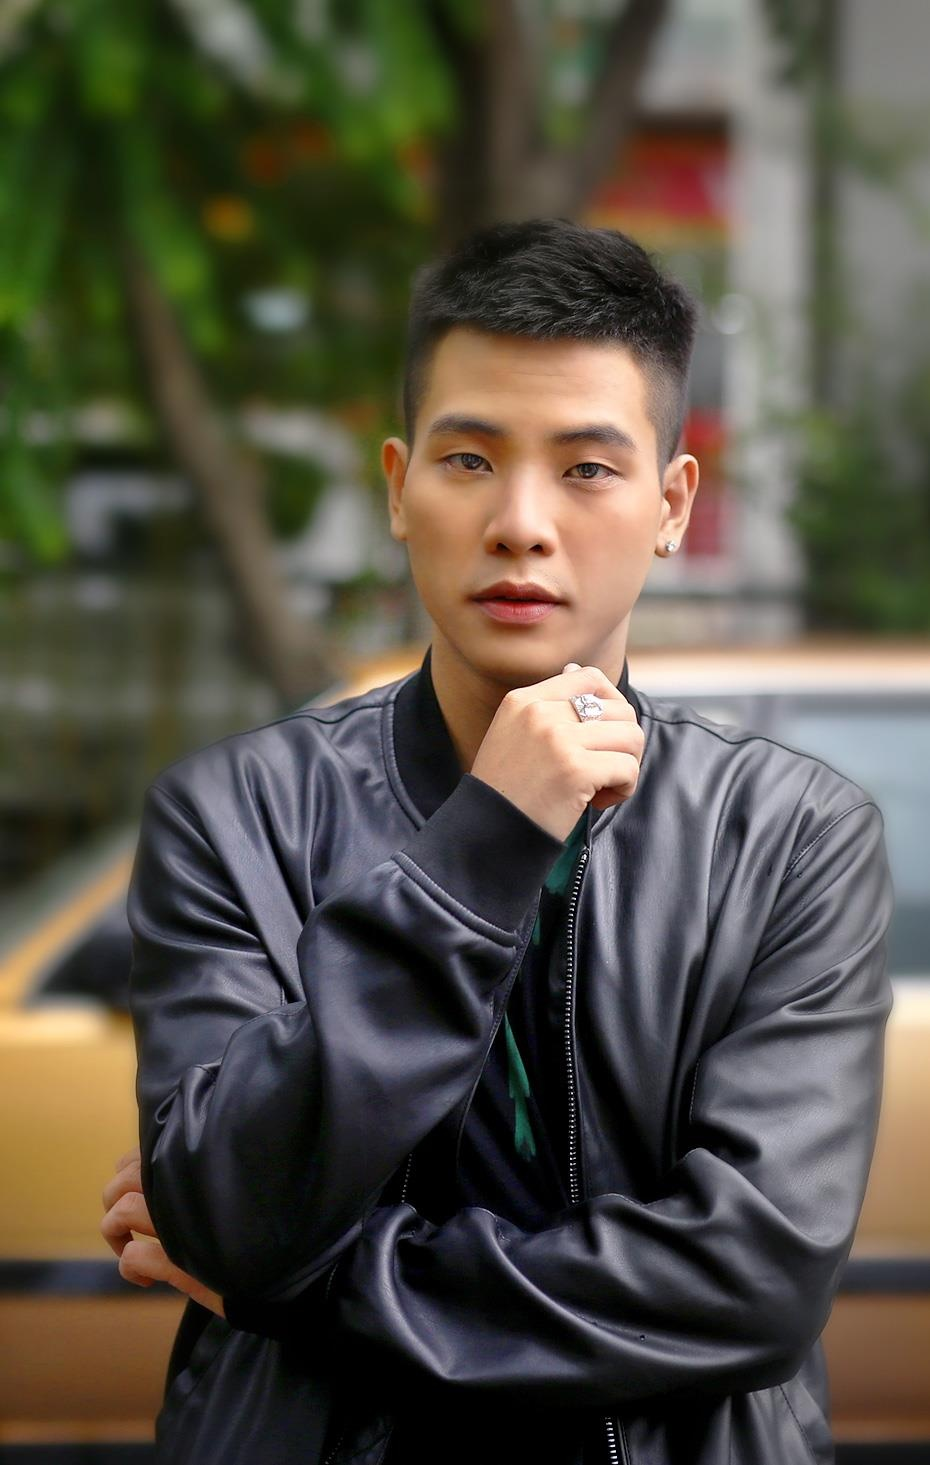 Chu nhan 'Ai la nguoi thuong em':  'Tuan Hung noi toi hat giong anh' hinh anh 5